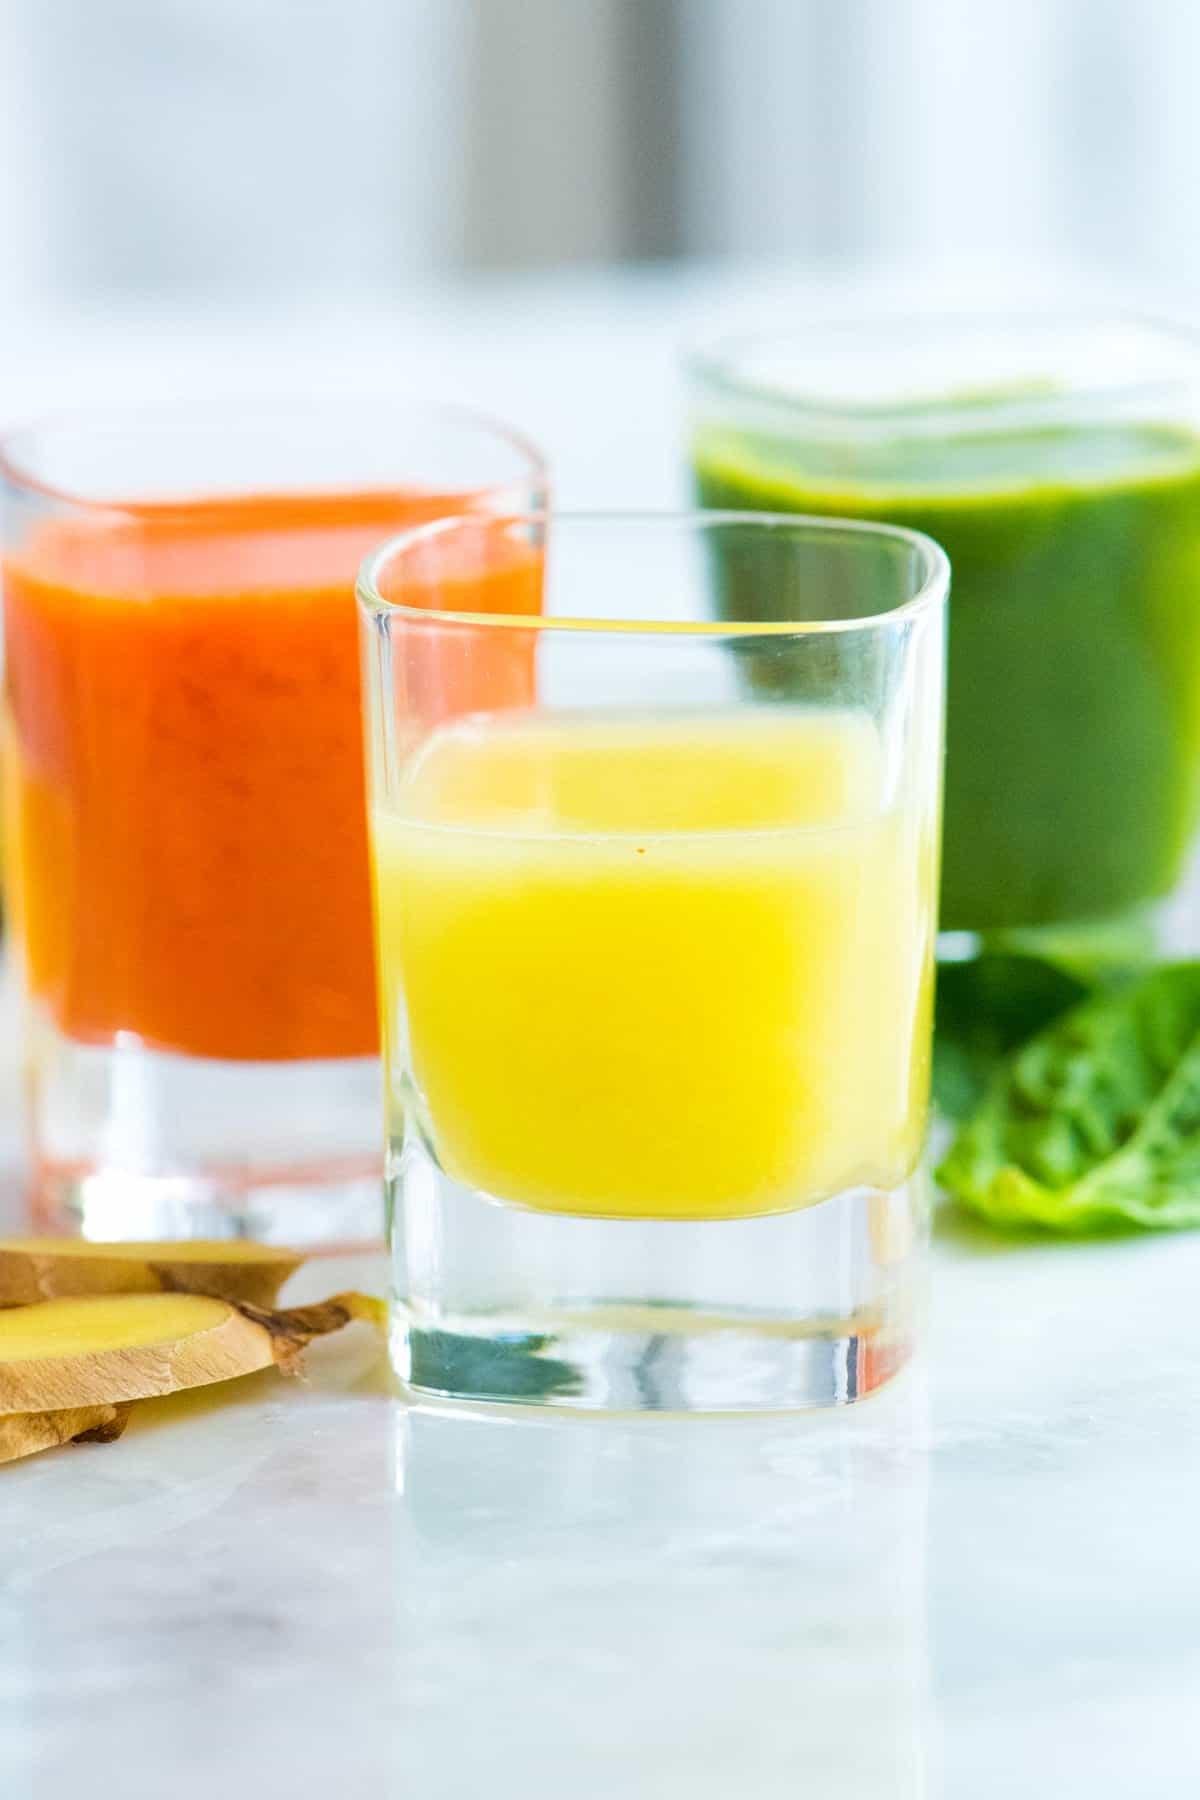 Tres recetas de Ginger Power Shot que incluyen Lemon Ginger, Carrot Ginger y Green Apple Ginger Shot